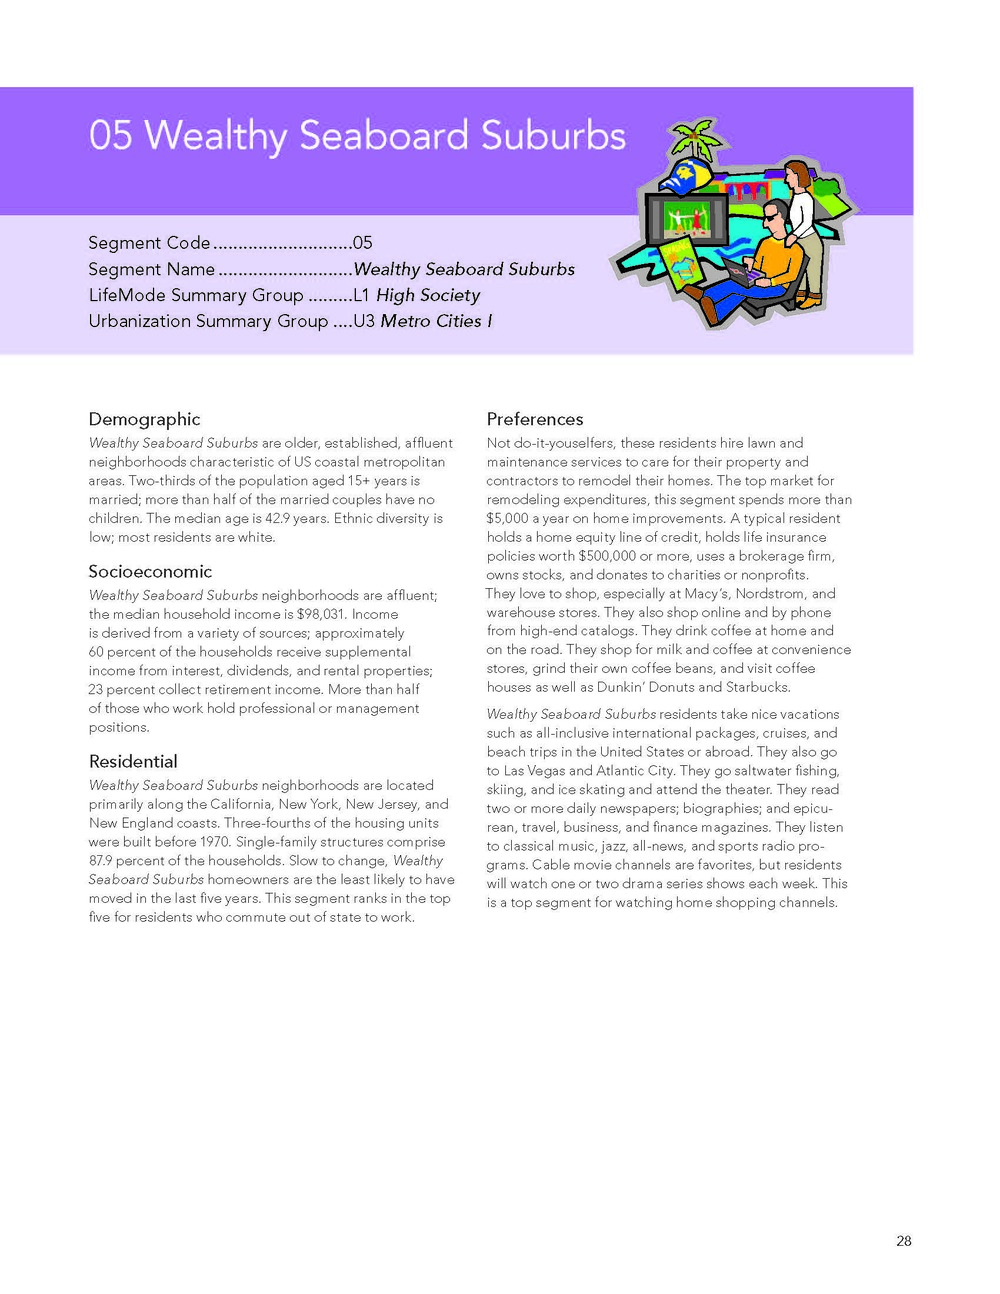 tapestry-segmentation_Page_31.jpg